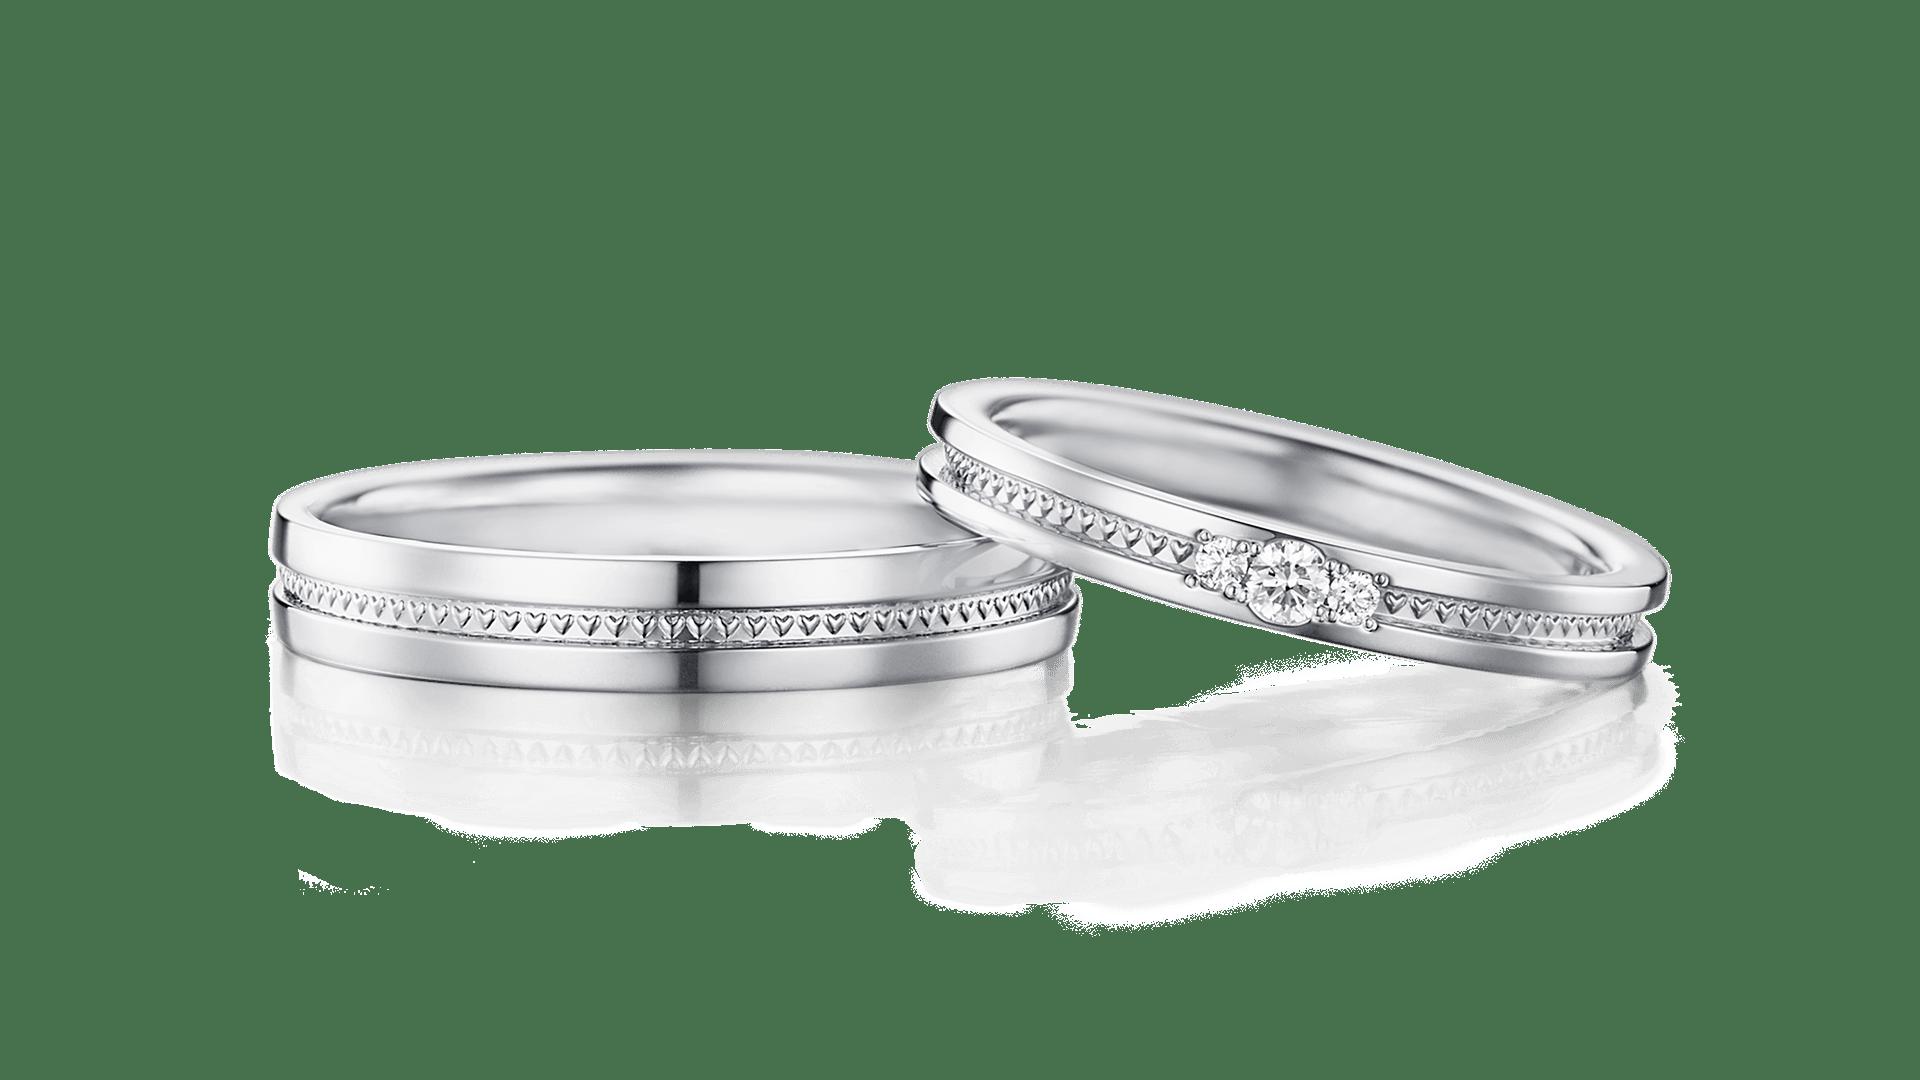 dione ディオーネ | 結婚指輪サムネイル 1